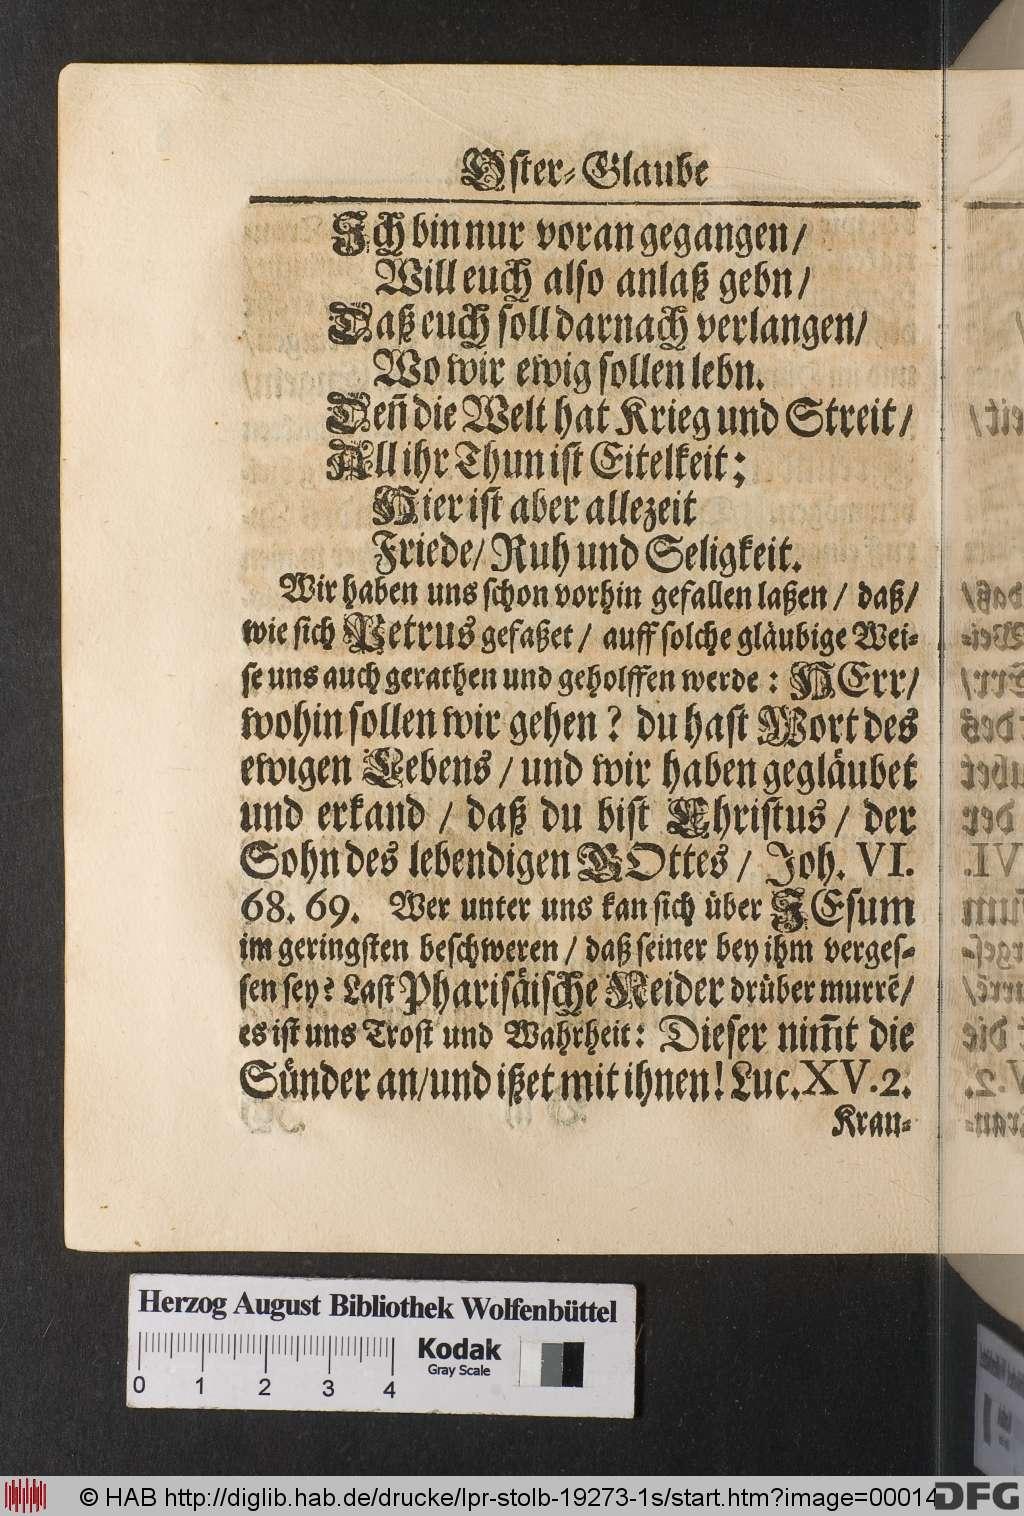 http://diglib.hab.de/drucke/lpr-stolb-19273-1s/00014.jpg